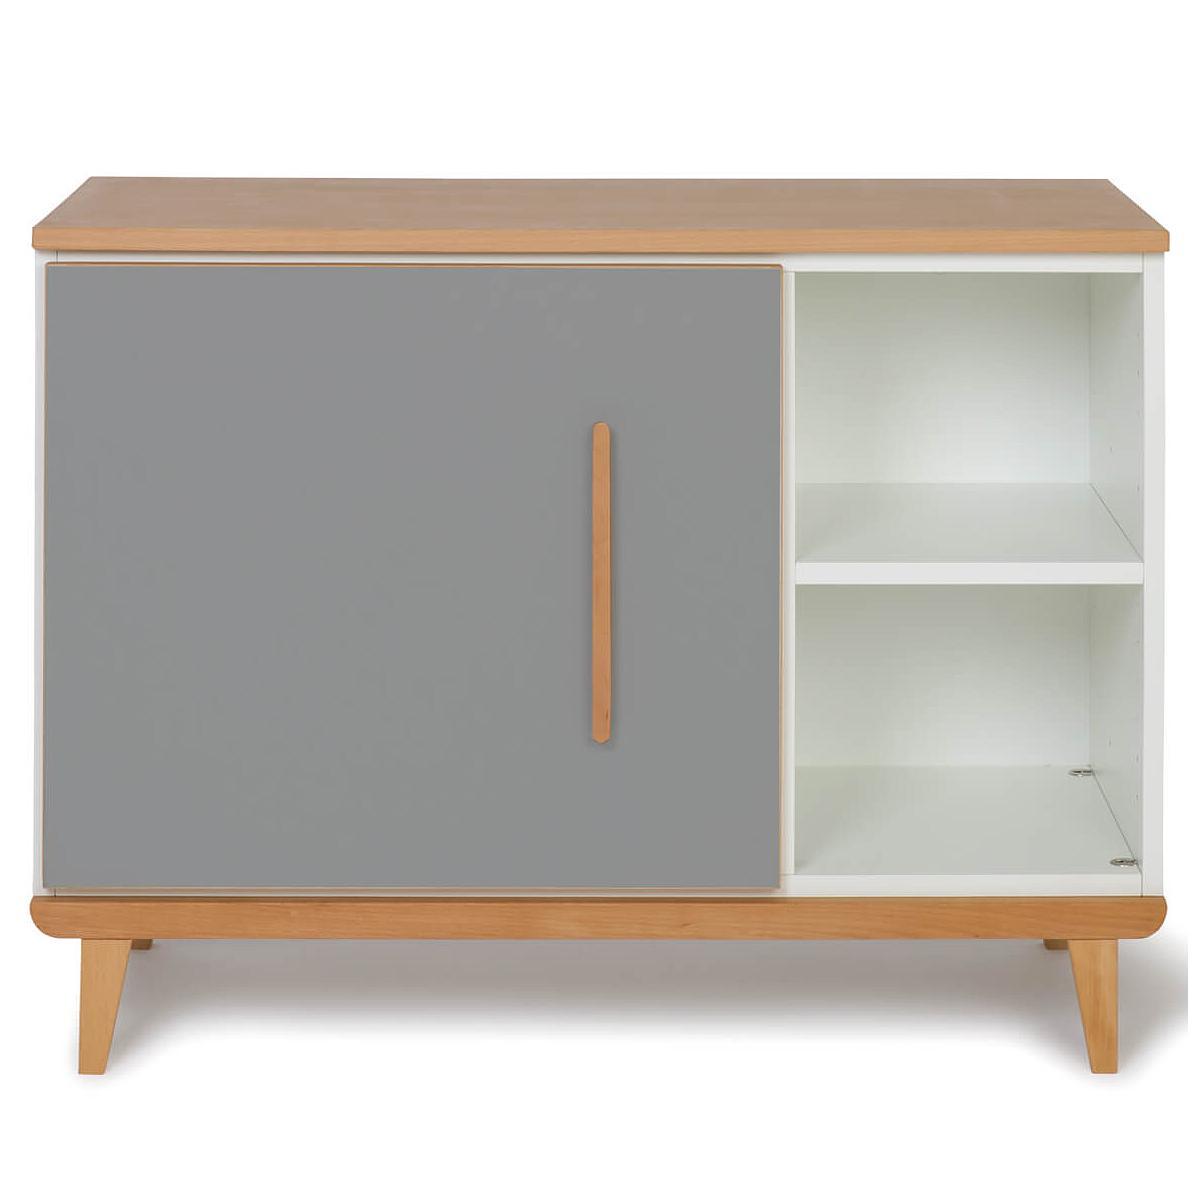 Wookids - Petit meuble 1 porte NADO slate grey